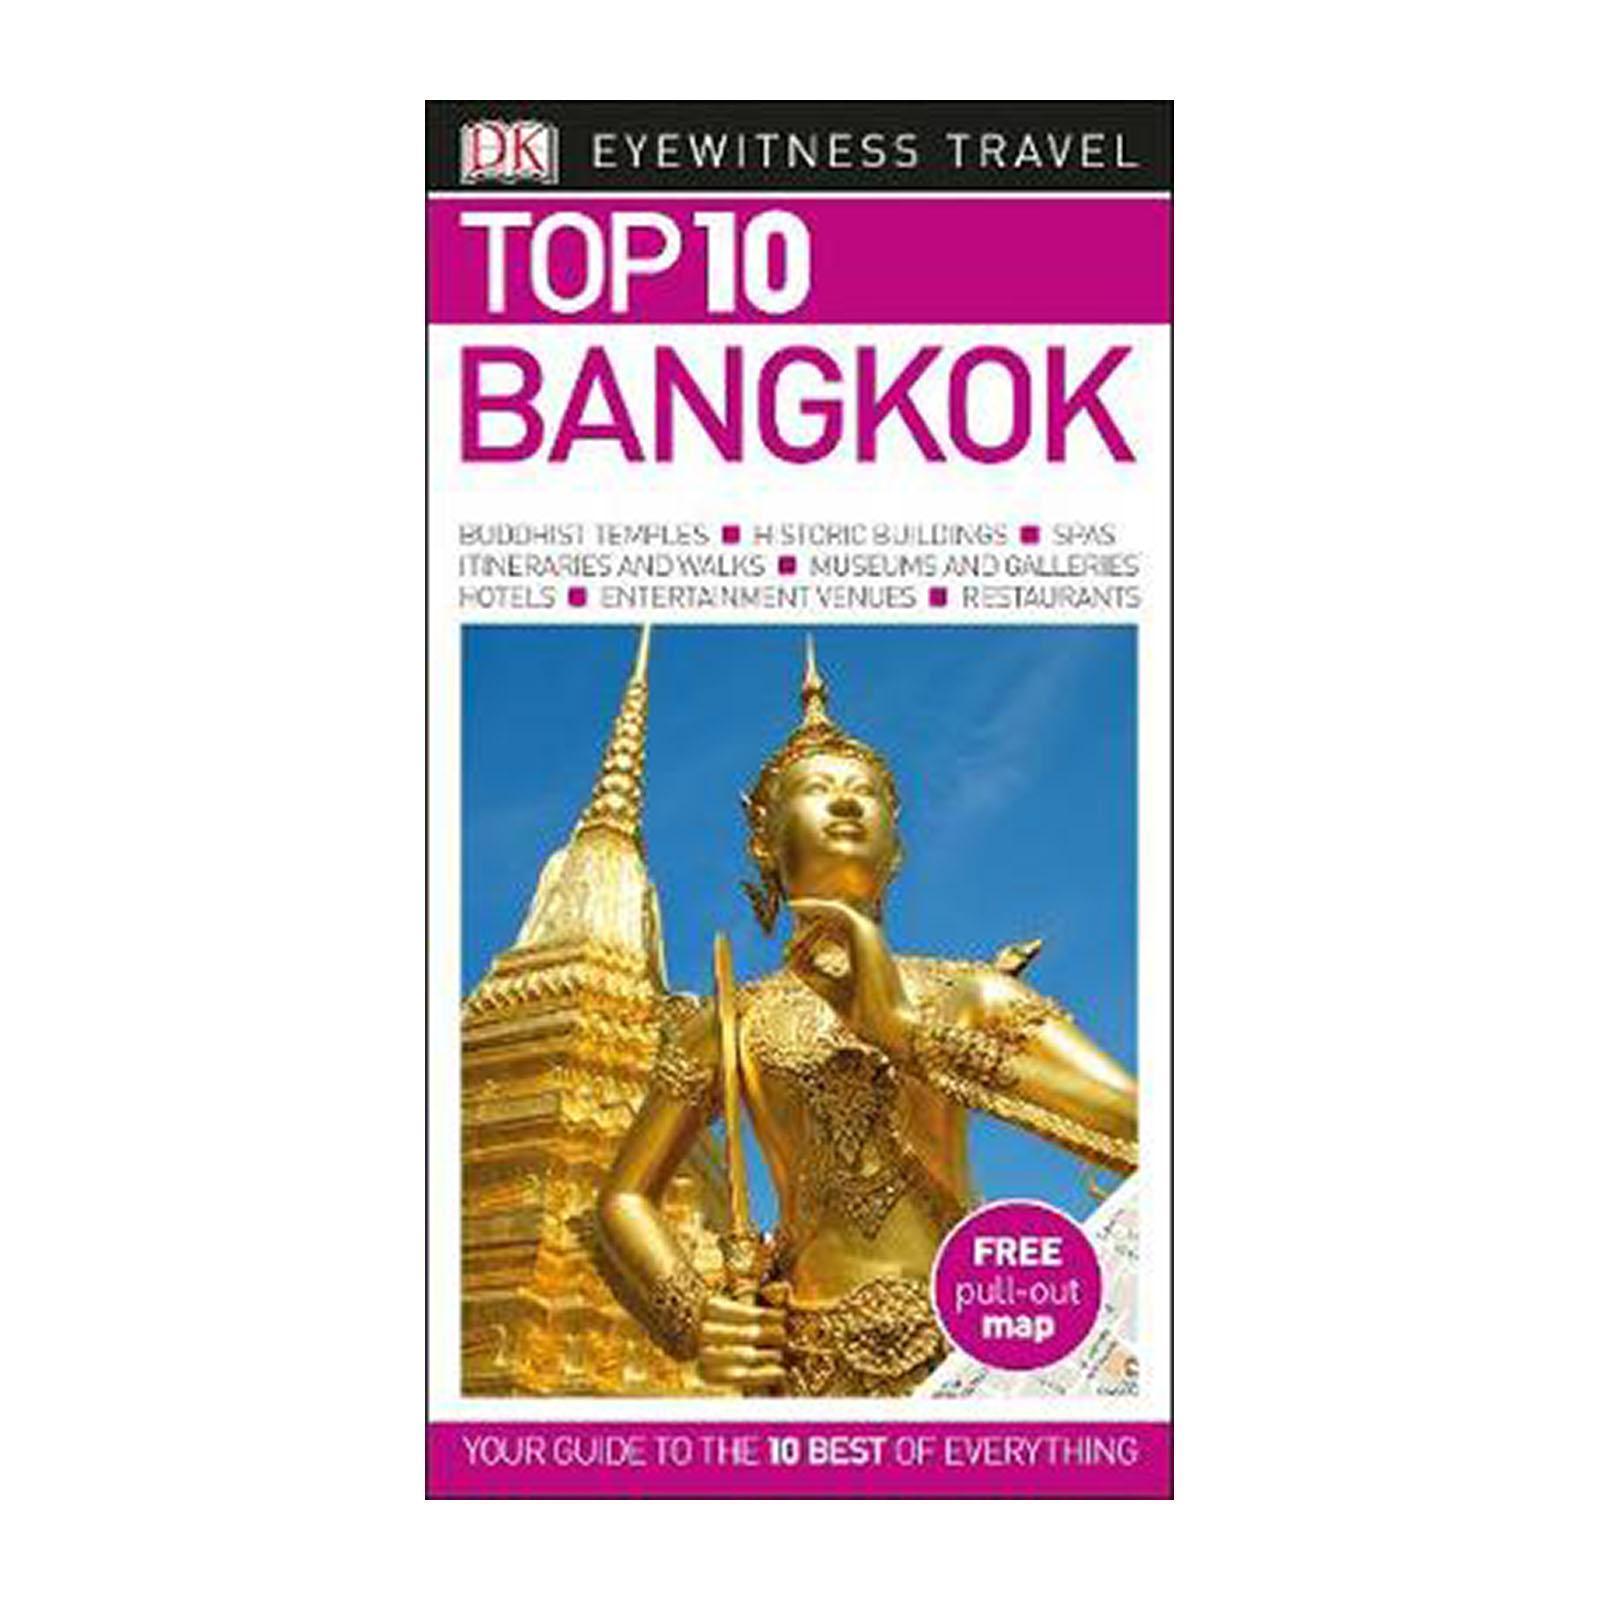 Top 10 Bangkok (Paperback)